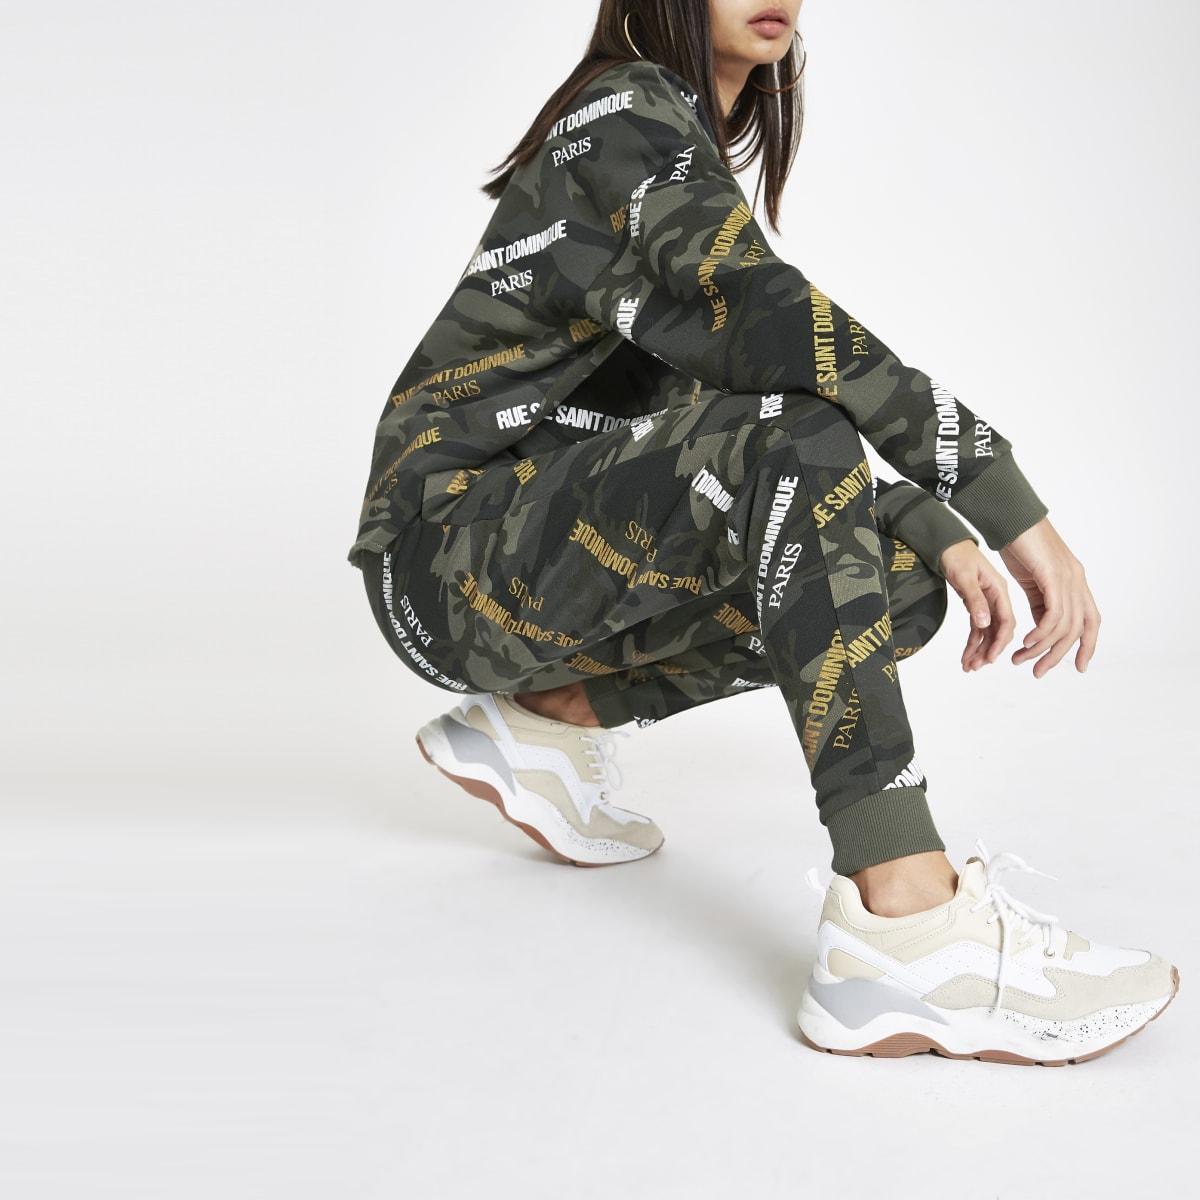 Khaki camo 'Rue Dominique' print joggers